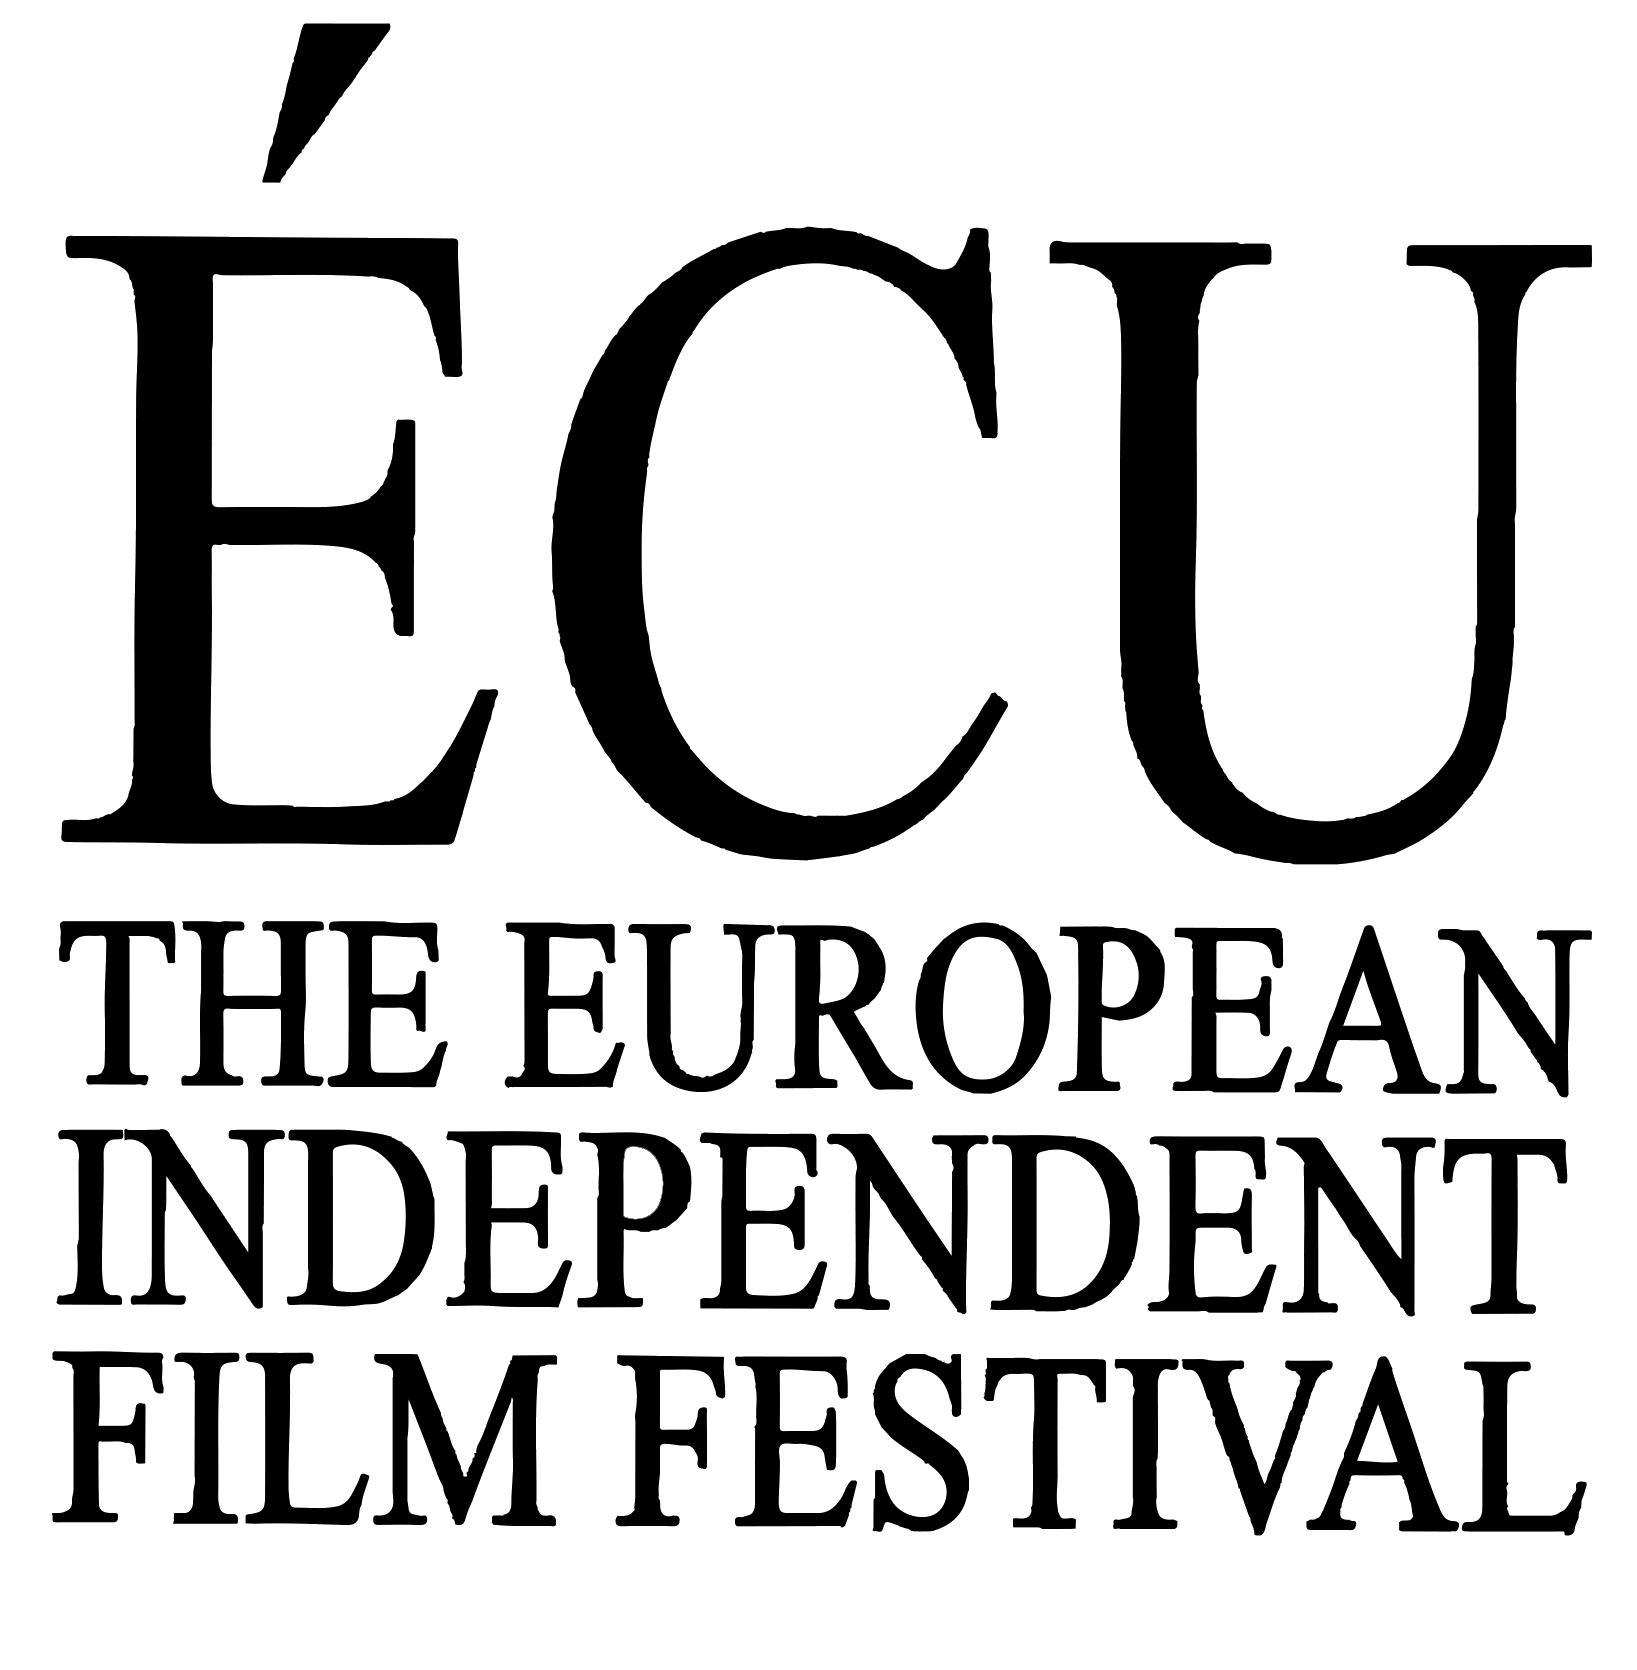 Ecu The European Independent Film Festival Wikipedia